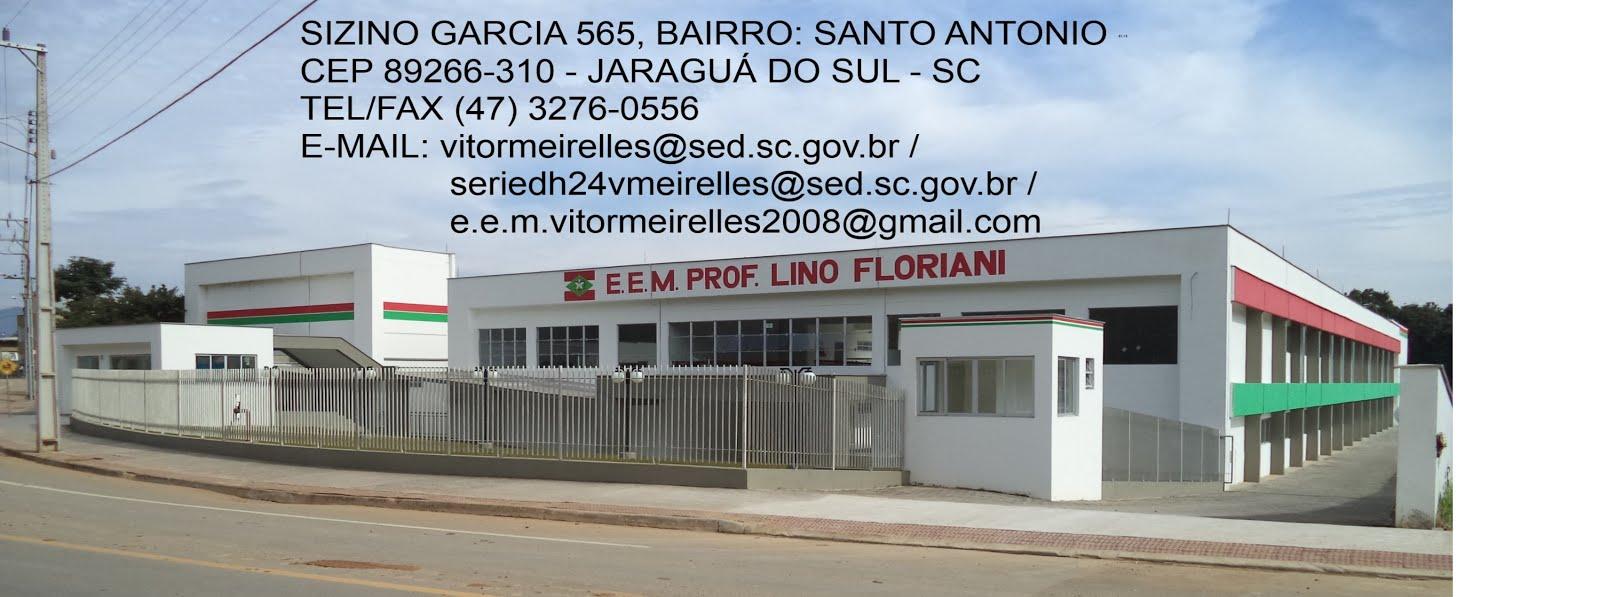 "ESCOLA DE ENSINO MÉDIO ""PROF. LINO FLORIANI"""